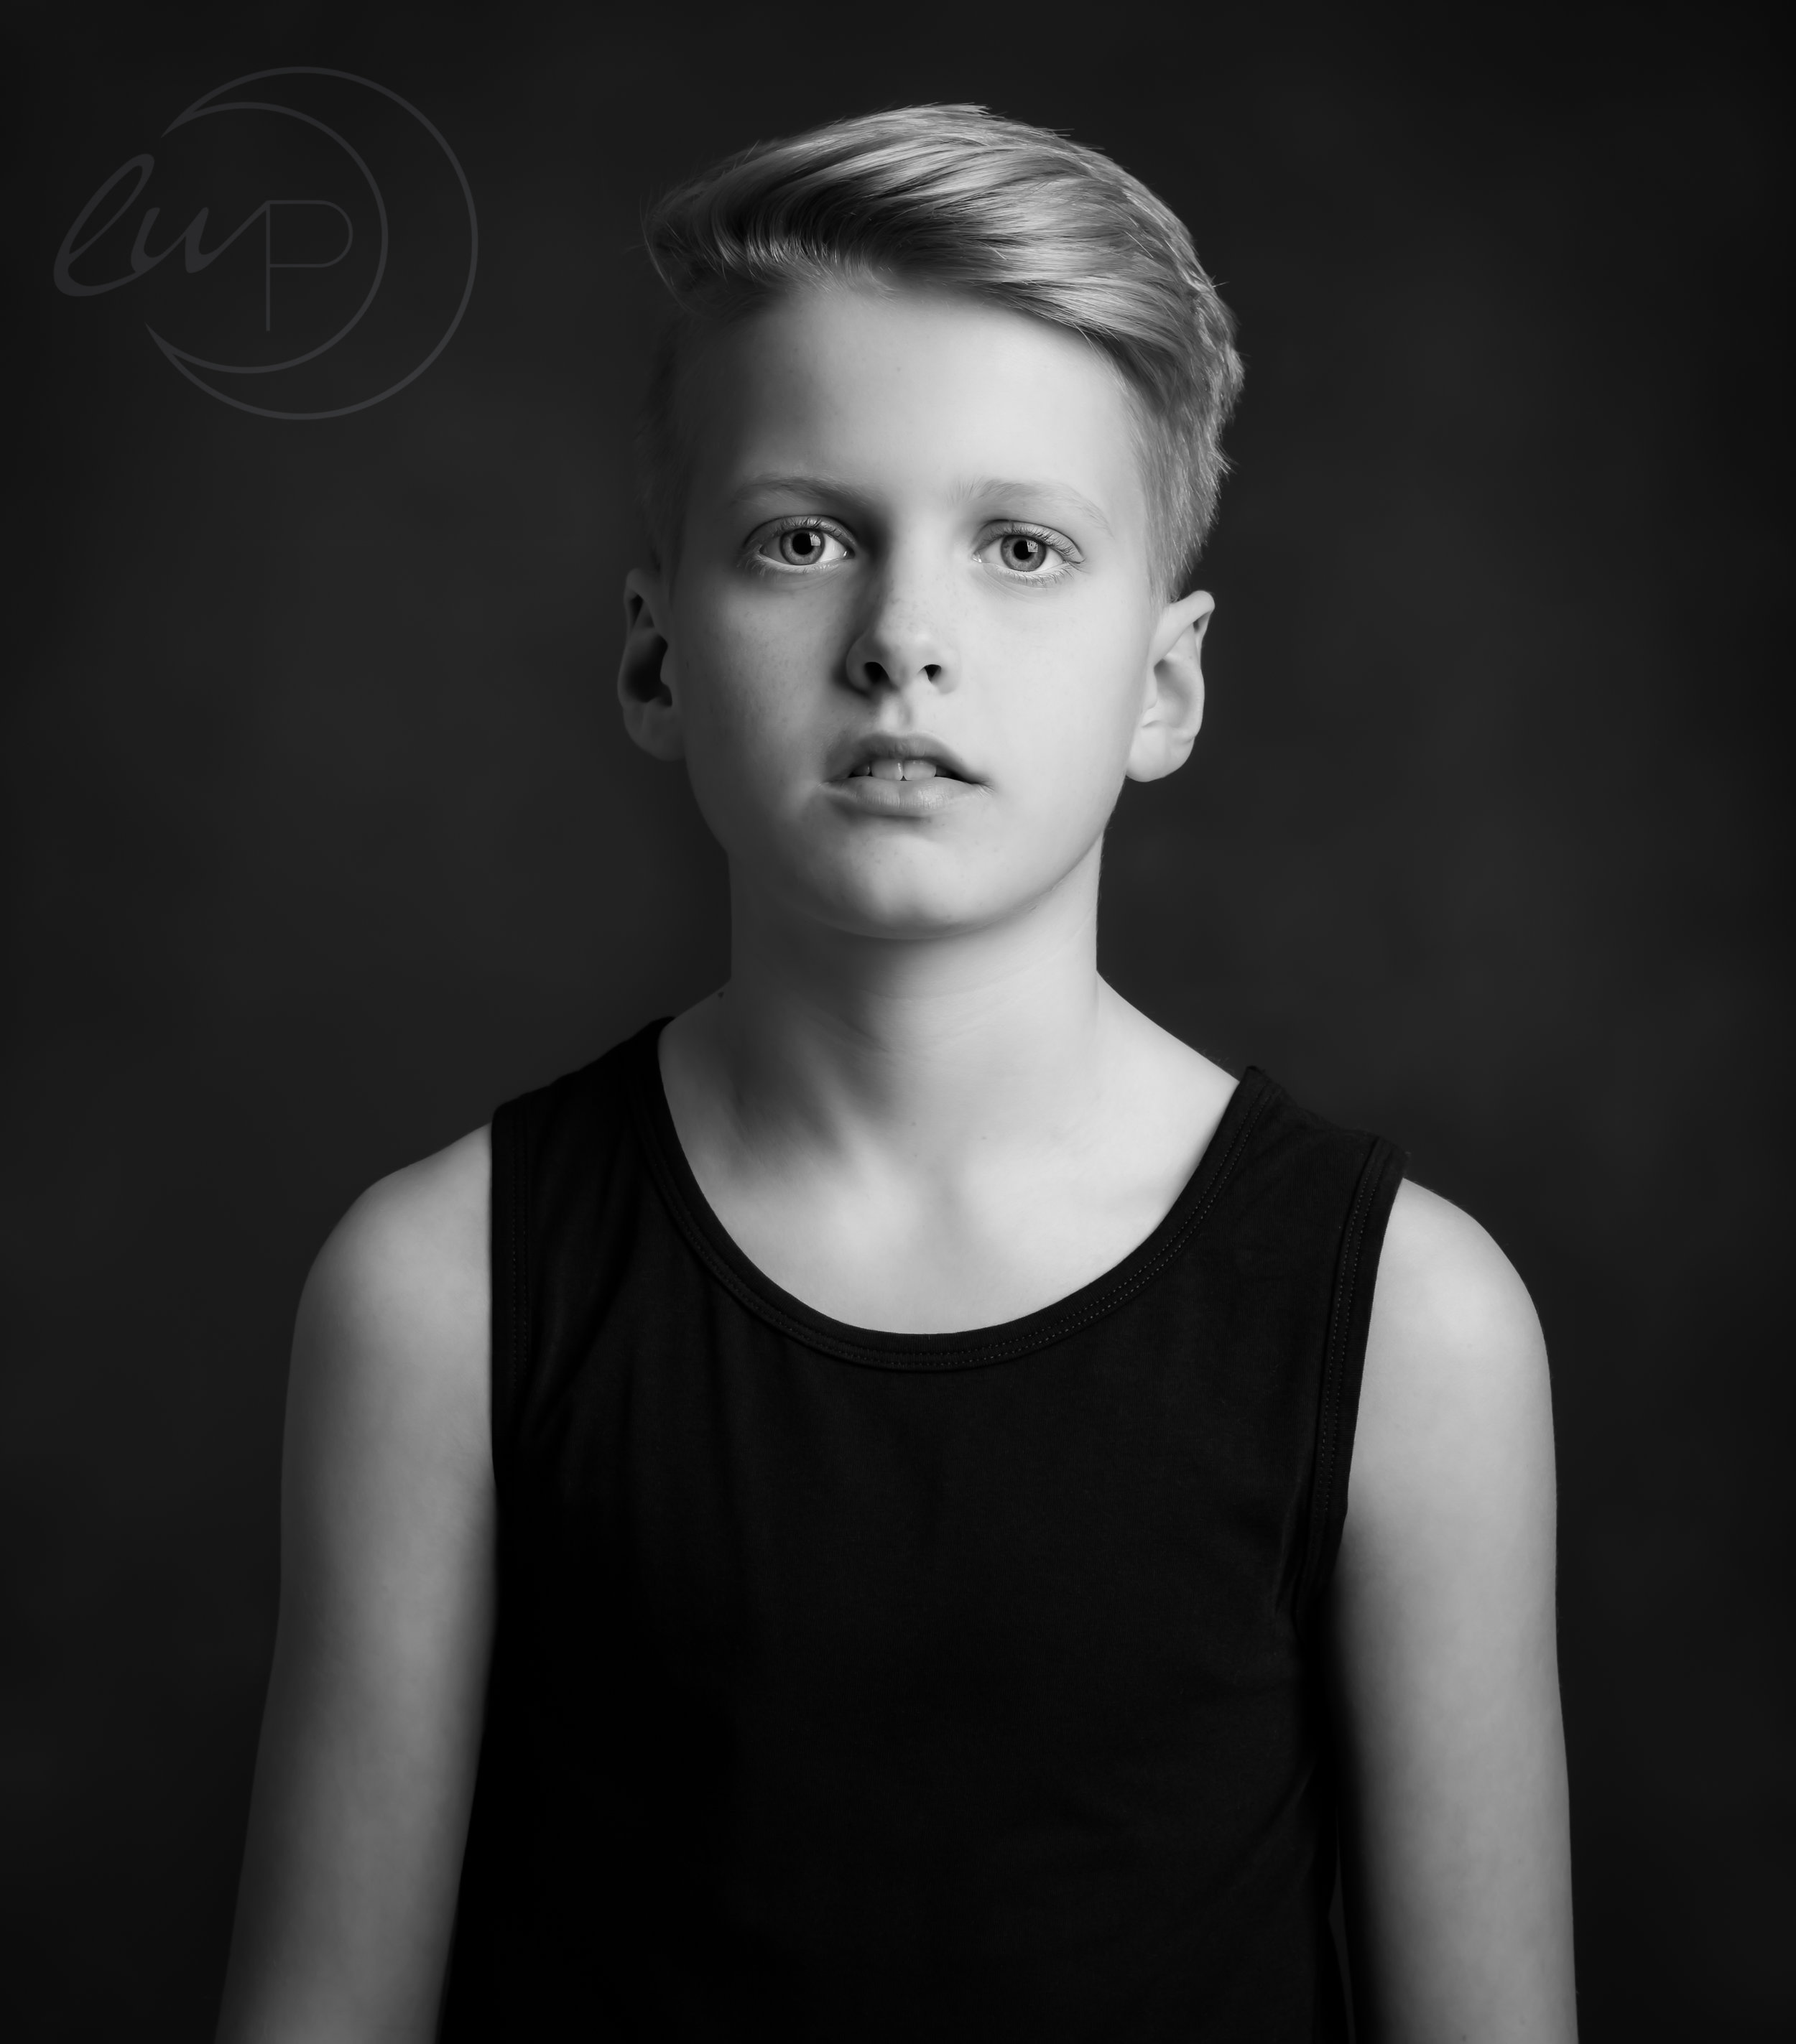 kids modelling portfolio photos essex